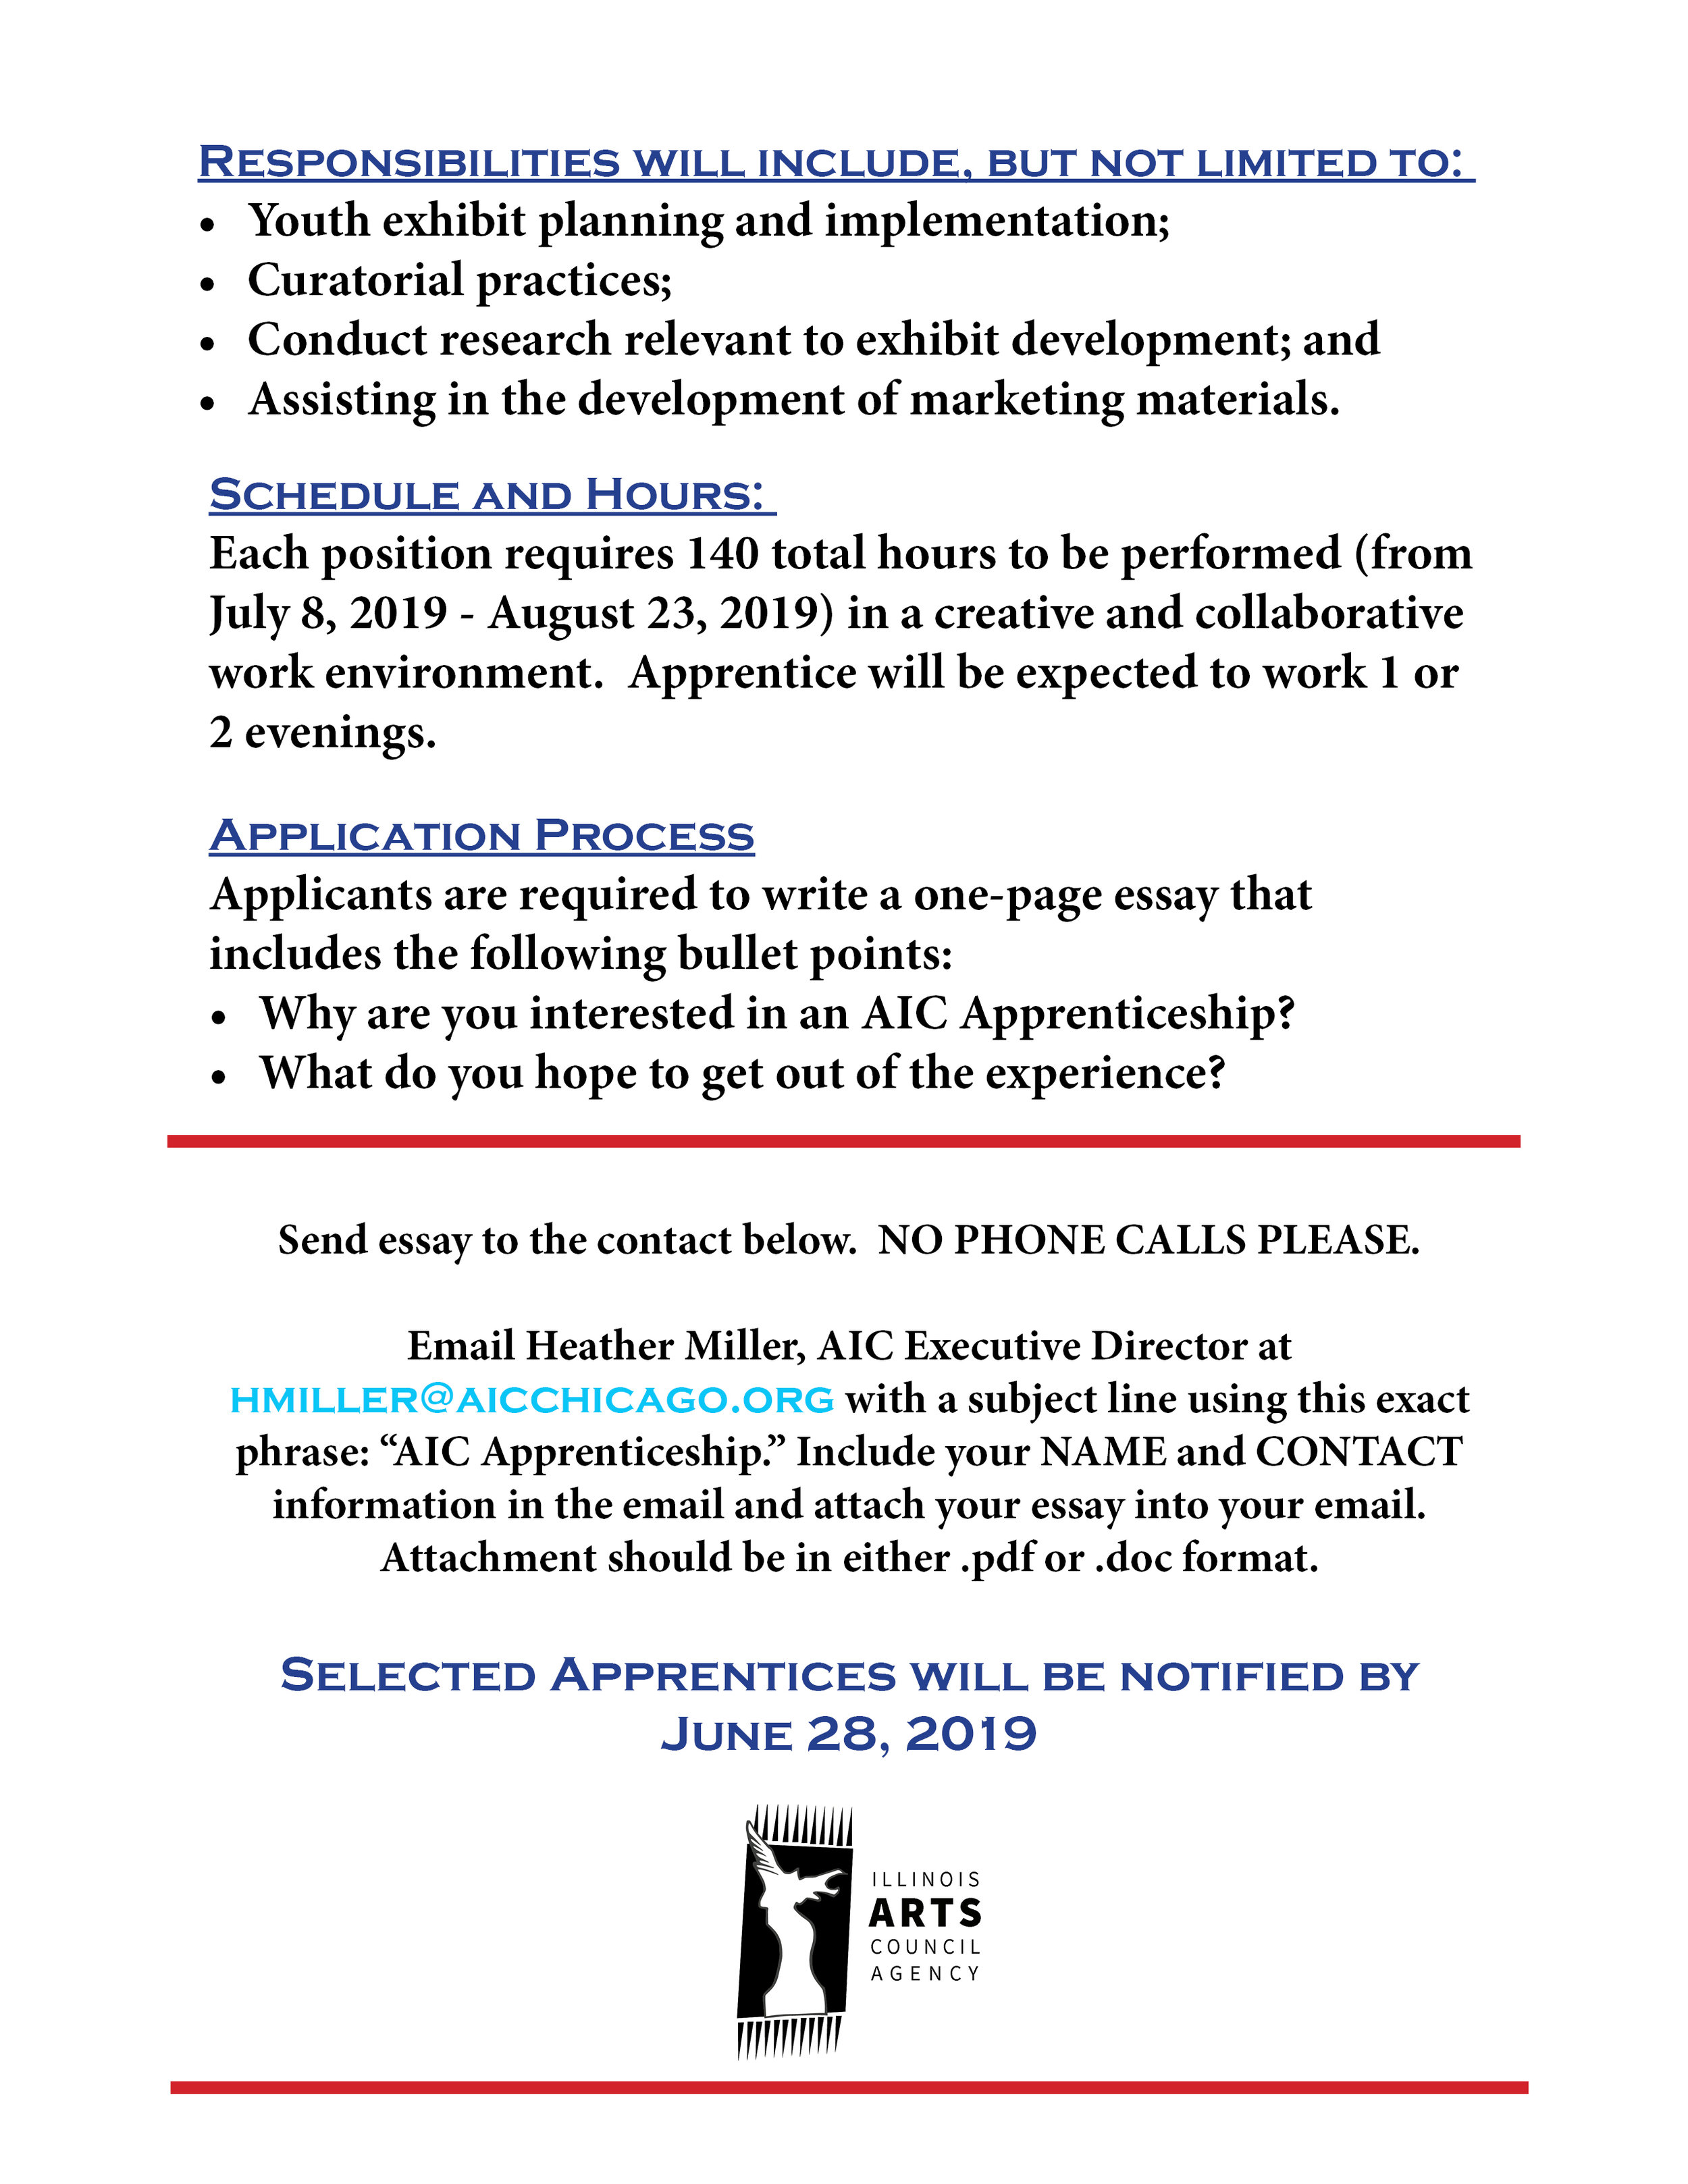 Summer Aprrenticeship_June 2019_FINAL2.jpg